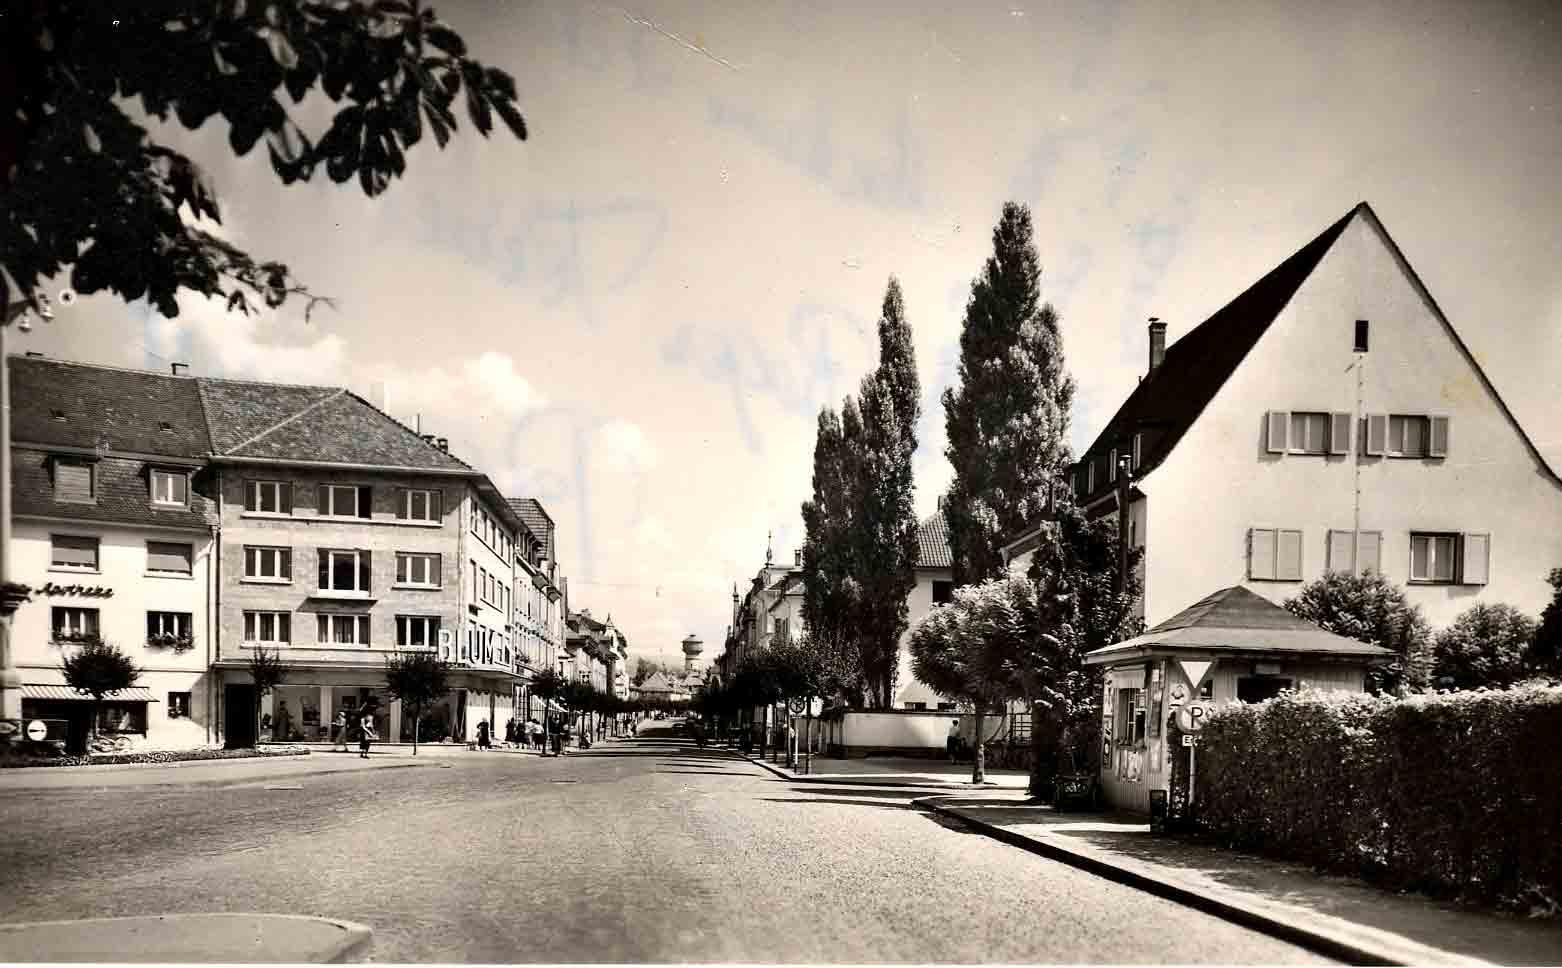 Friedrichsplatz (Fotografia dal 1950)